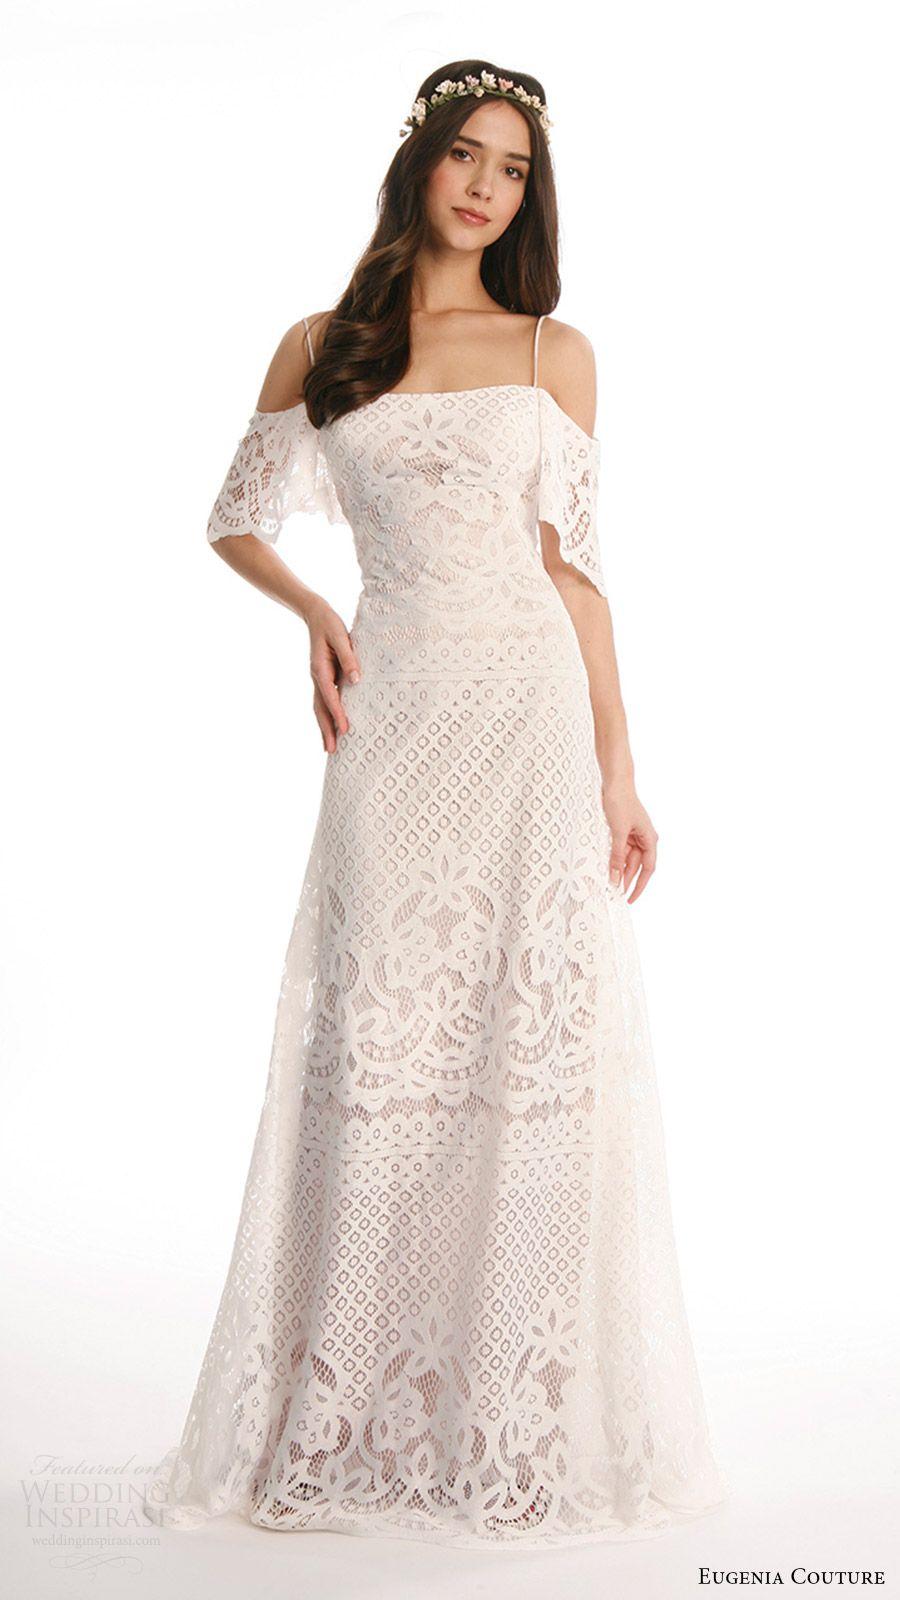 Eugenia couture spring wedding dresses u joy bridal collection